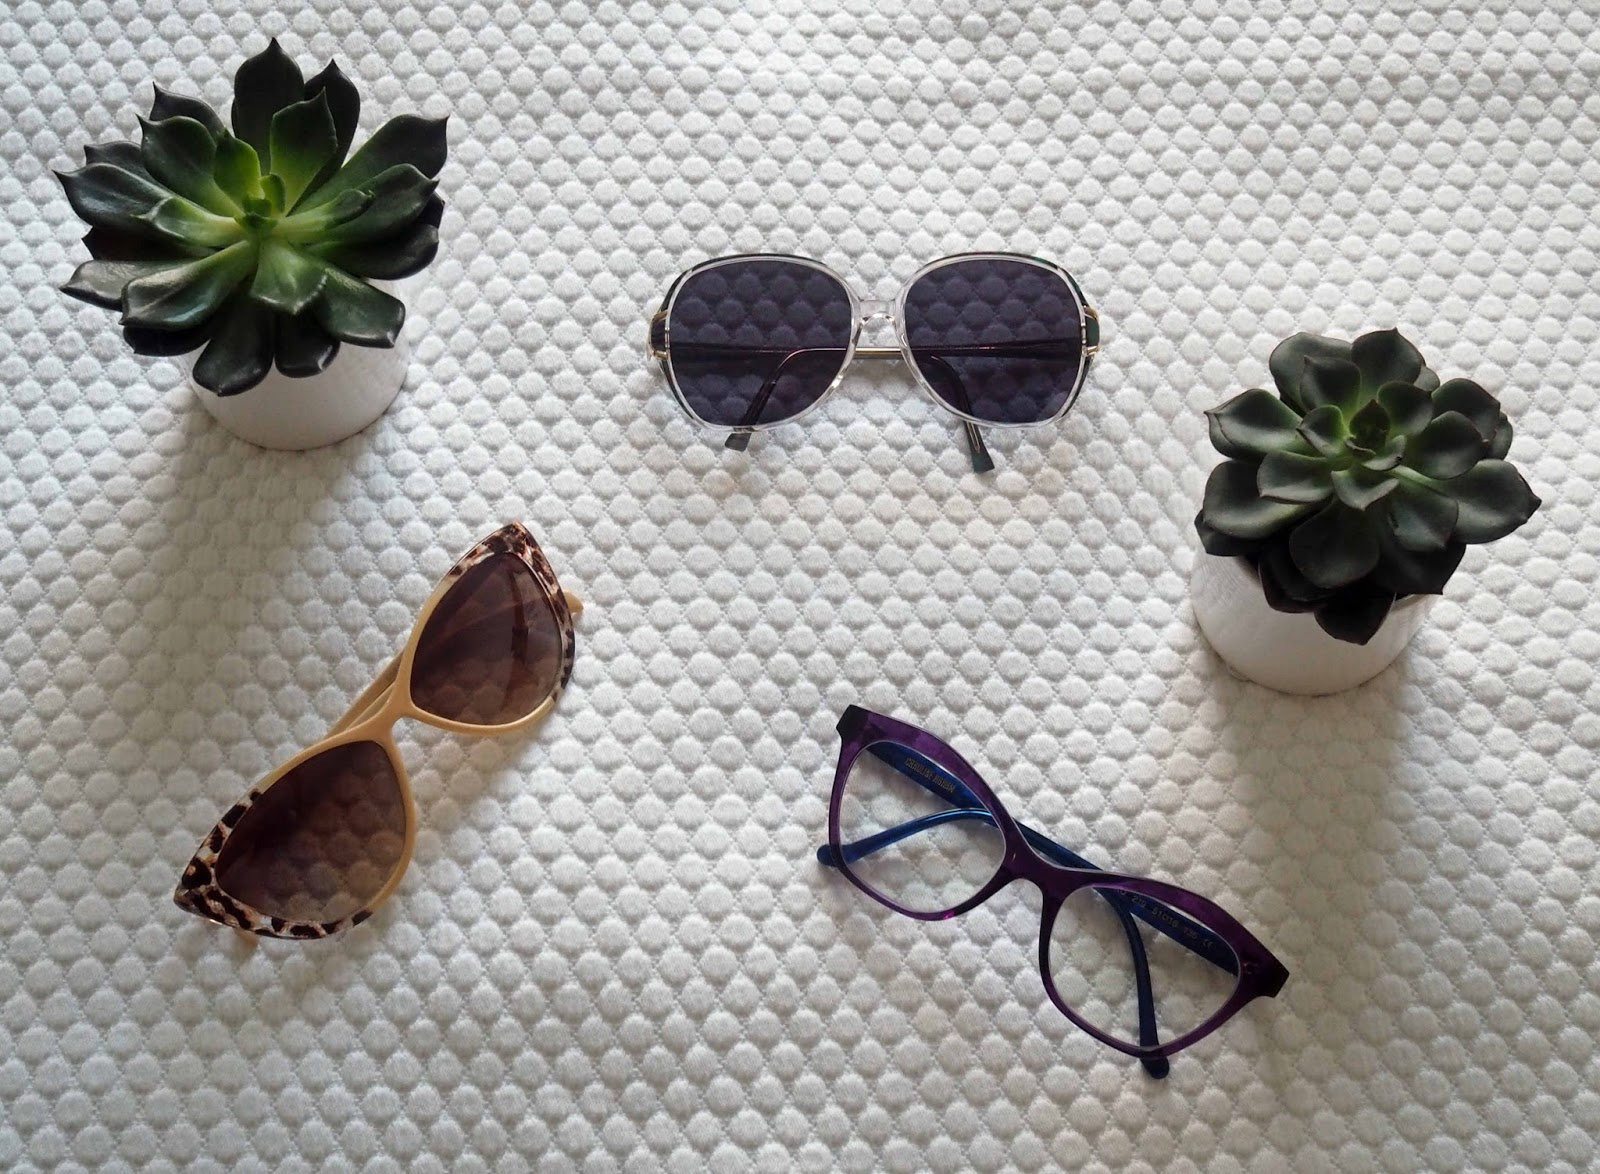 Holiday-packing-travel-Nerja-sunglasses